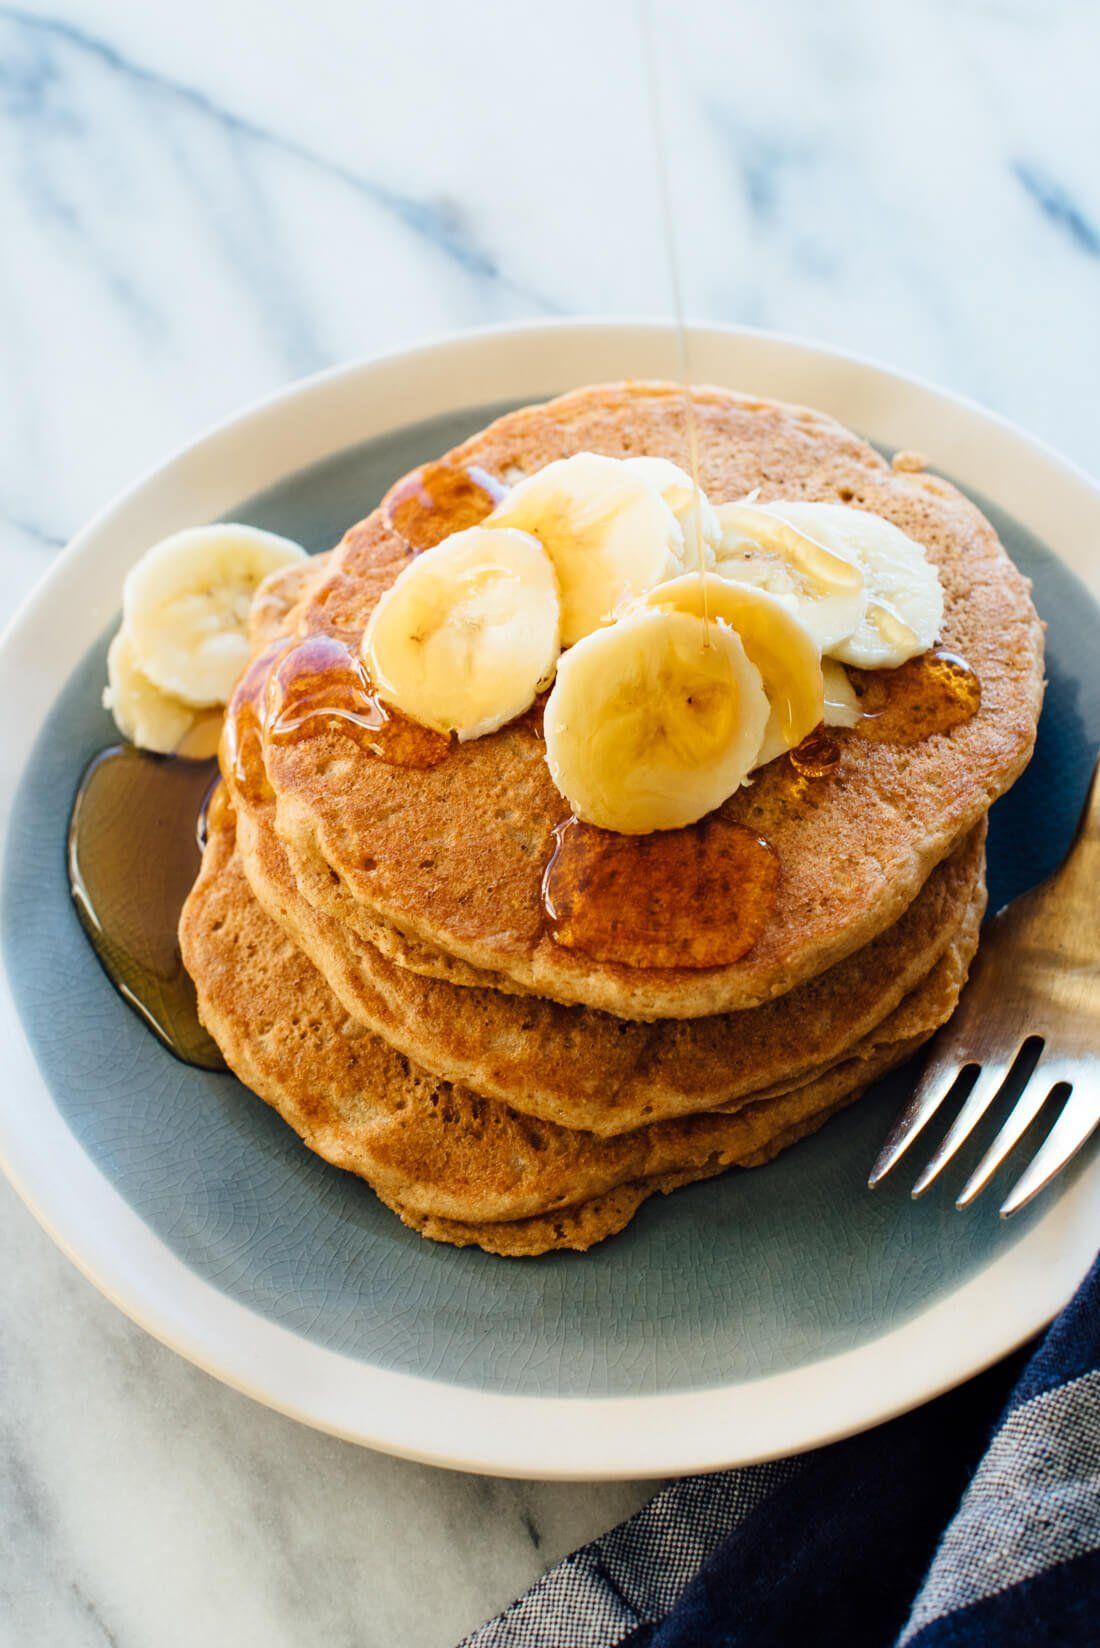 Whole Wheat Pancakes Recipe Cookie And Kate Recipe In 2020 Whole Wheat Pancakes Wheat Pancake Mix Wheat Pancakes